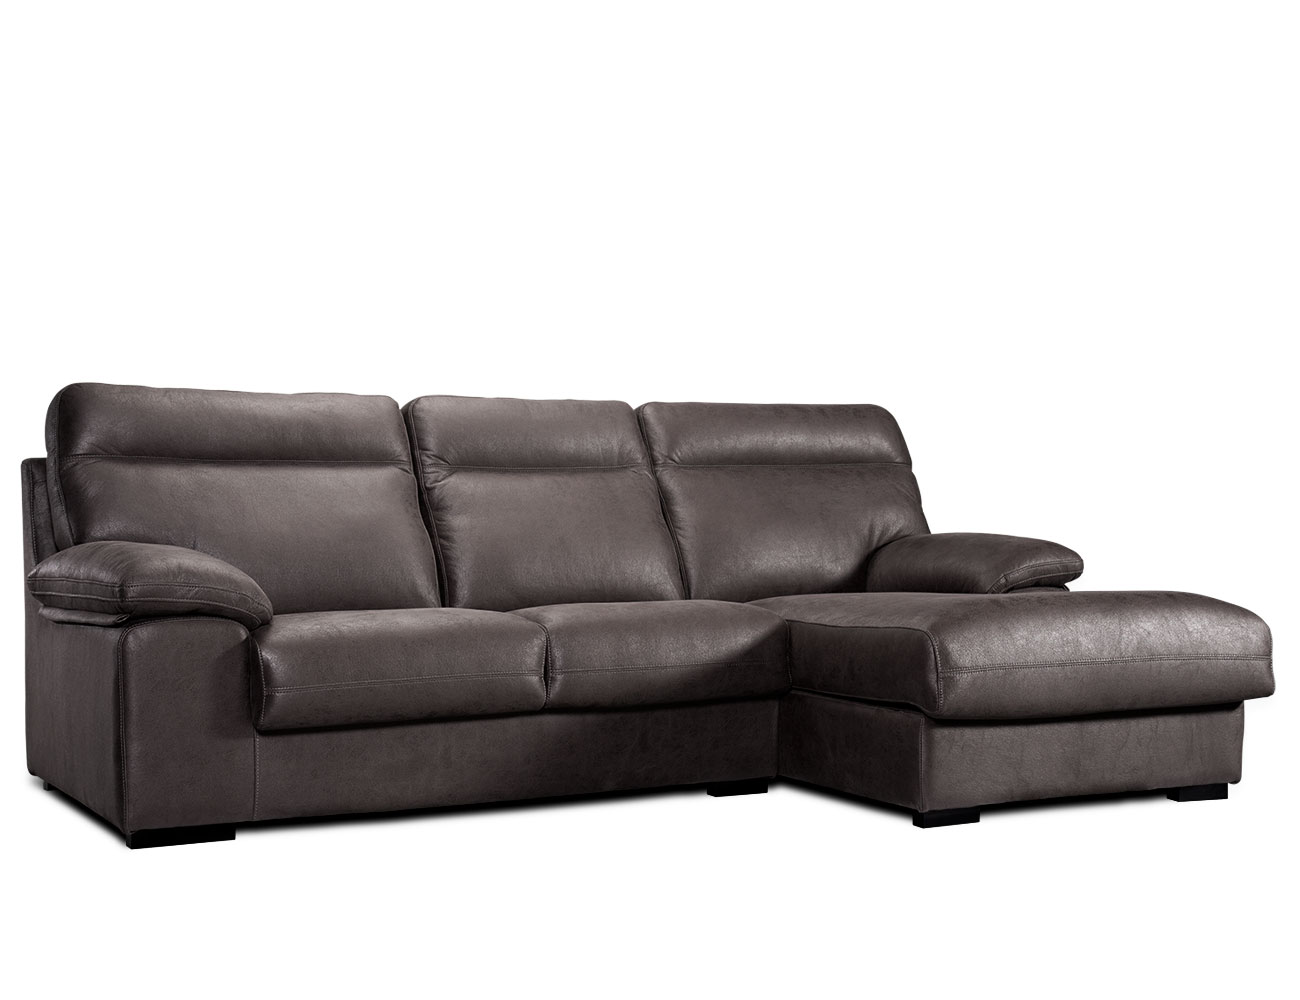 Sofa chaiselongue gran confort tejido antimanchas